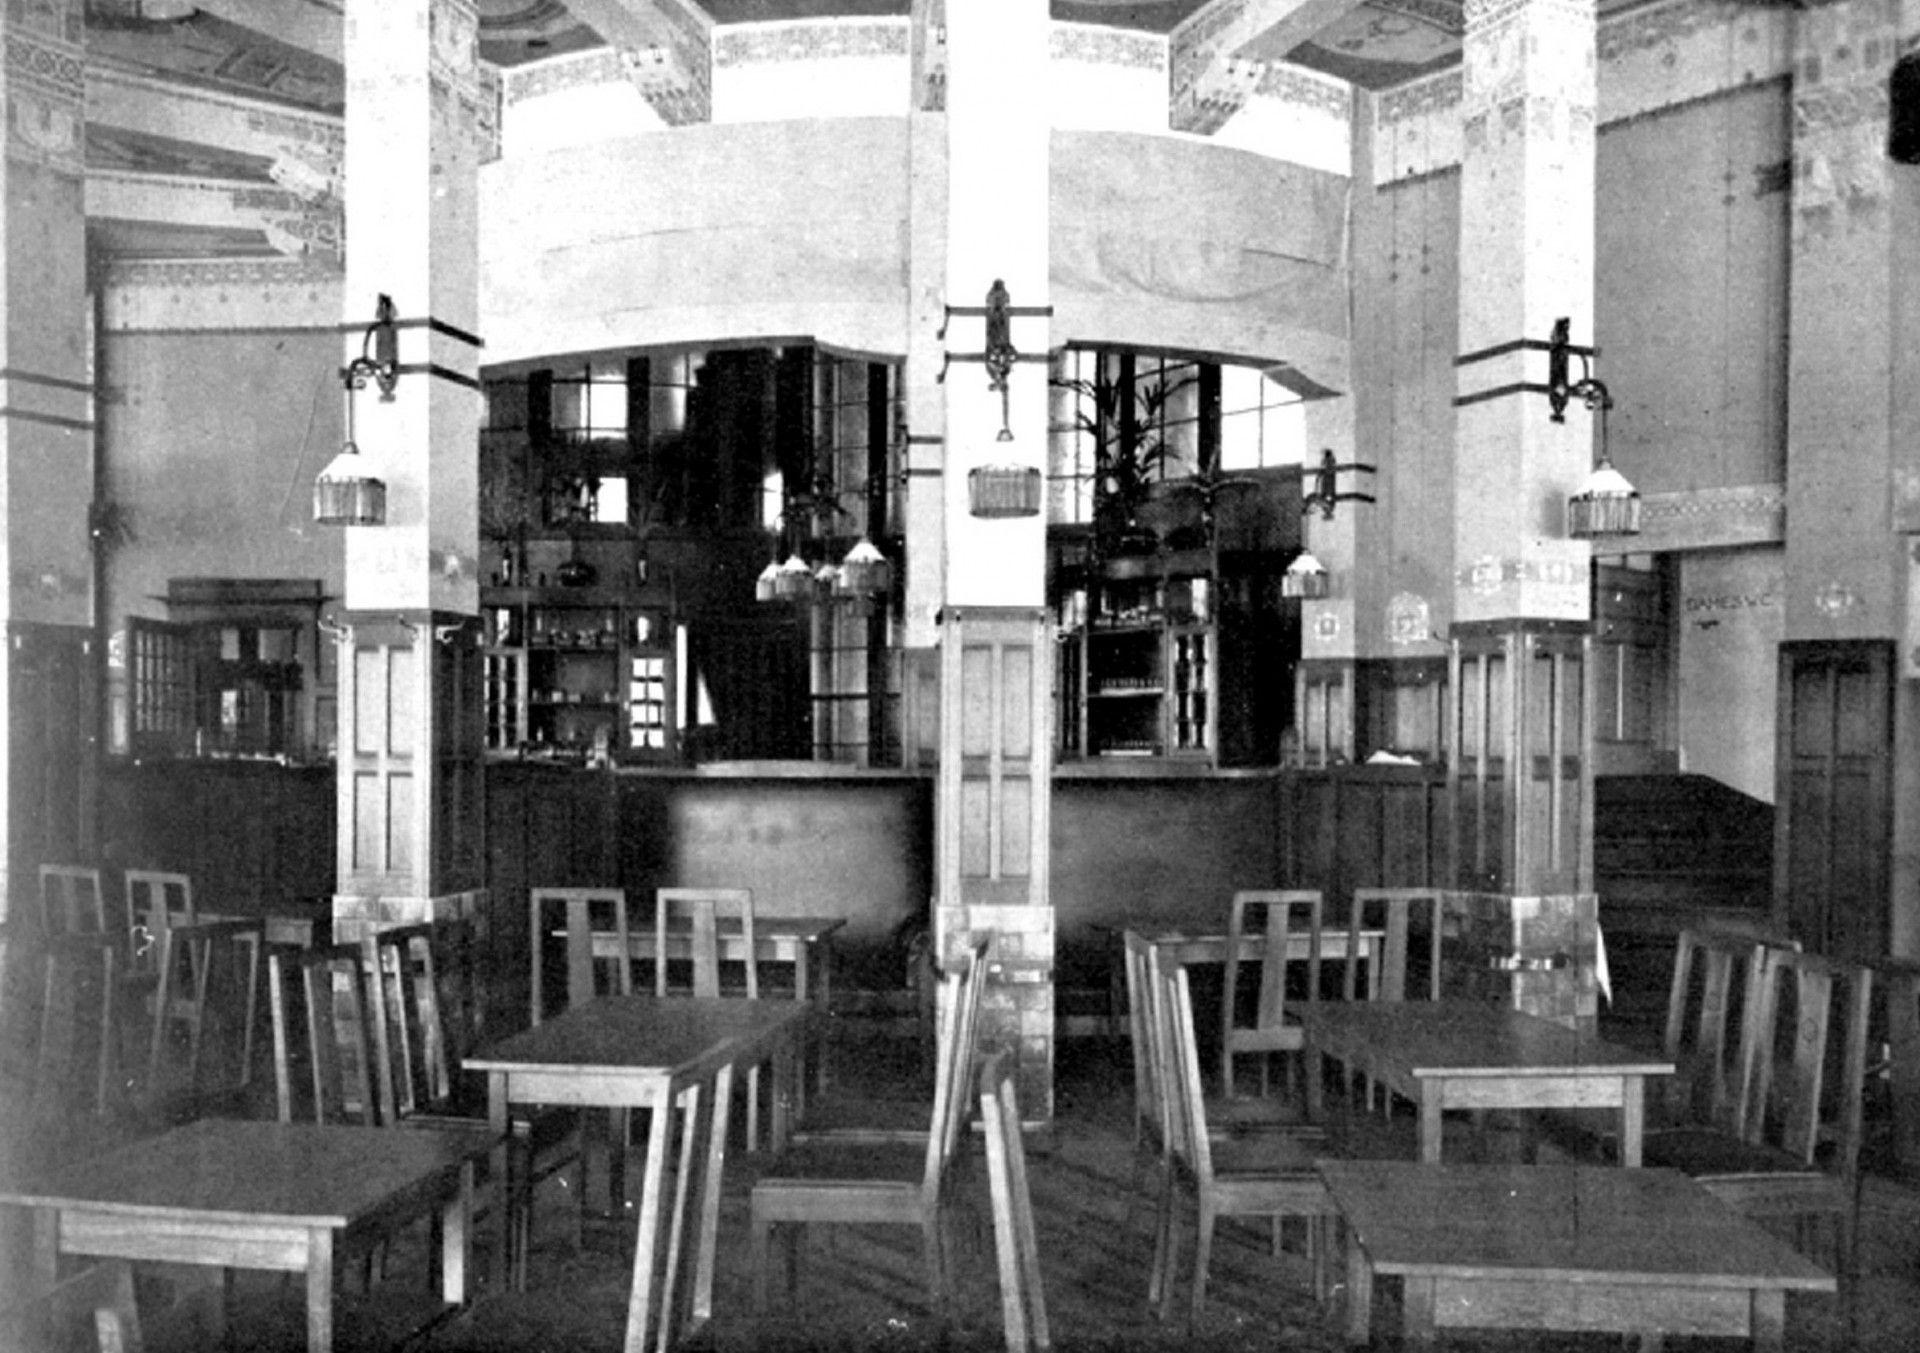 hofplein stations interieur voor 1940